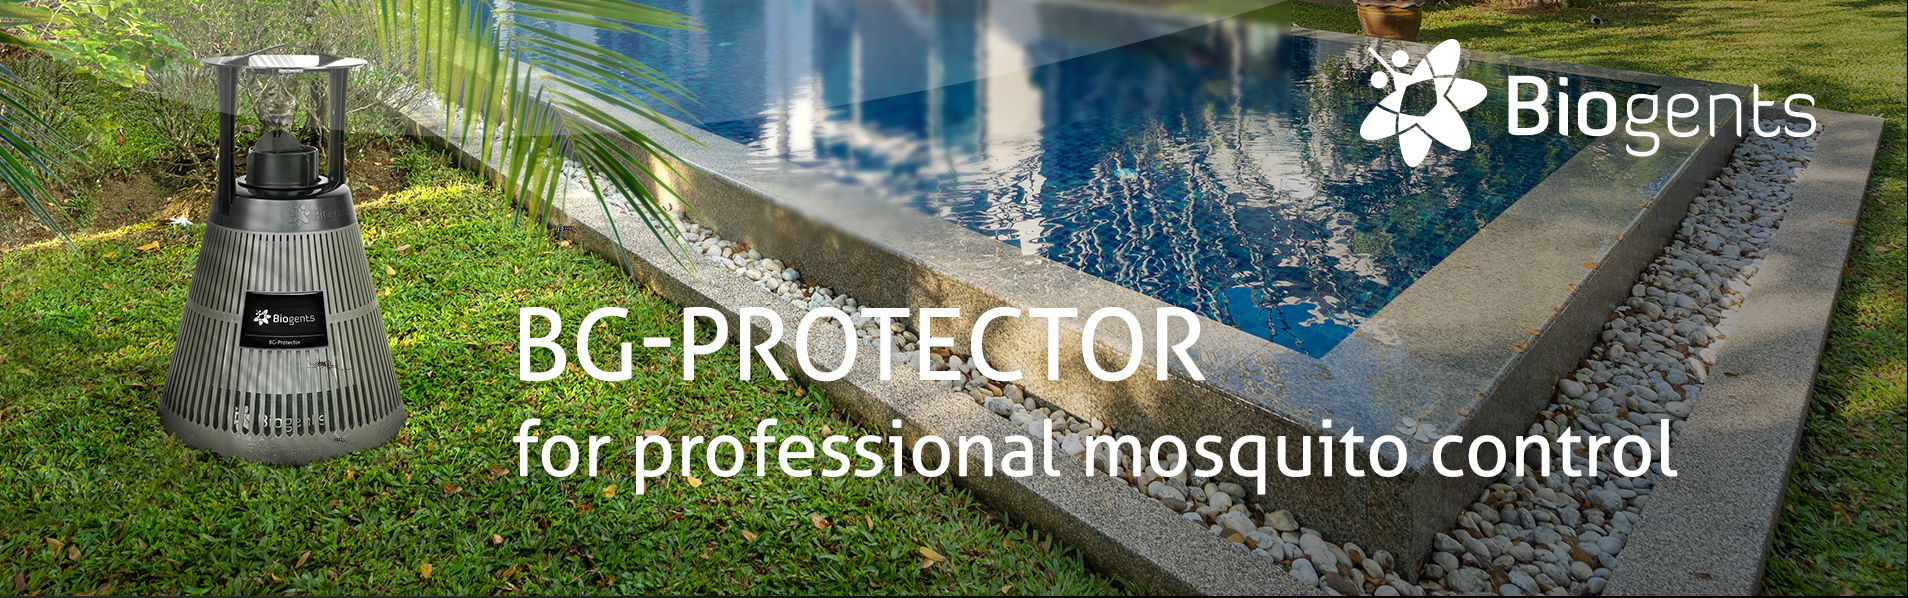 BG-Protector-2052x1080-PR-head-for-blog